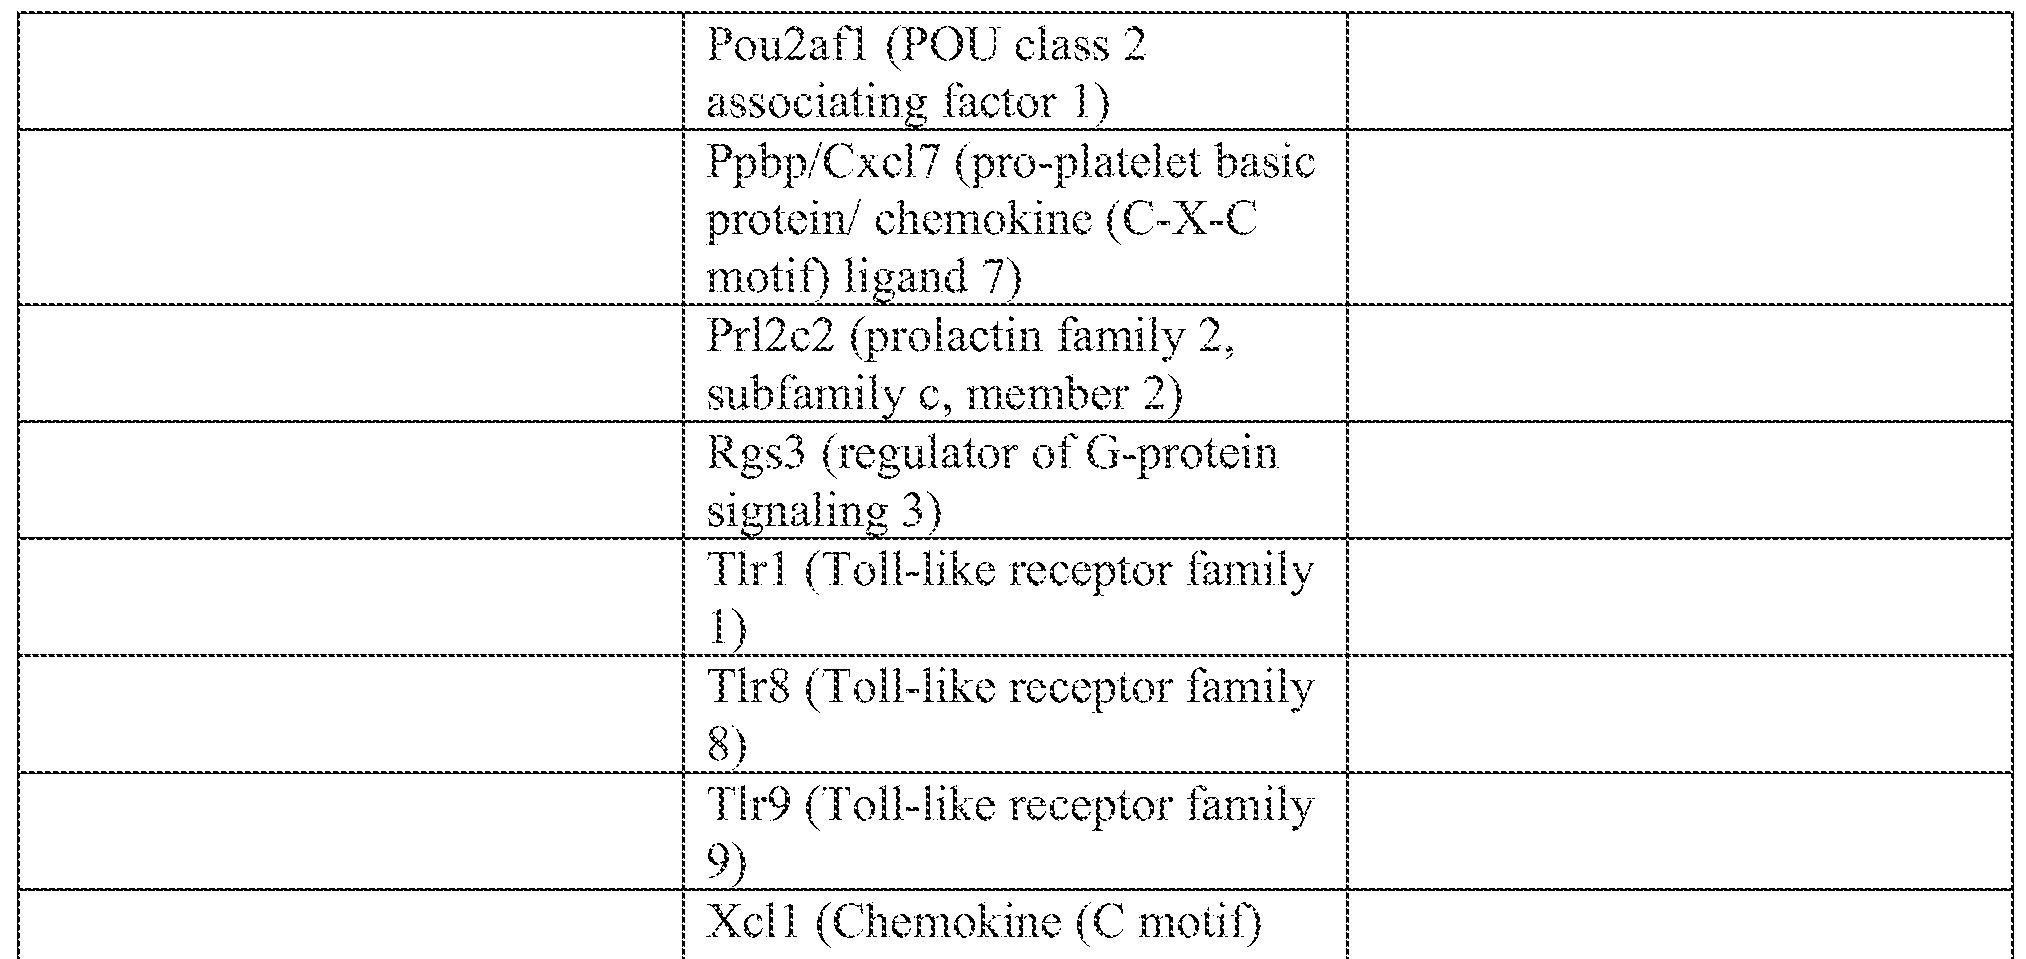 Pharmacokinetics of ciprofloxacin SpringerLink